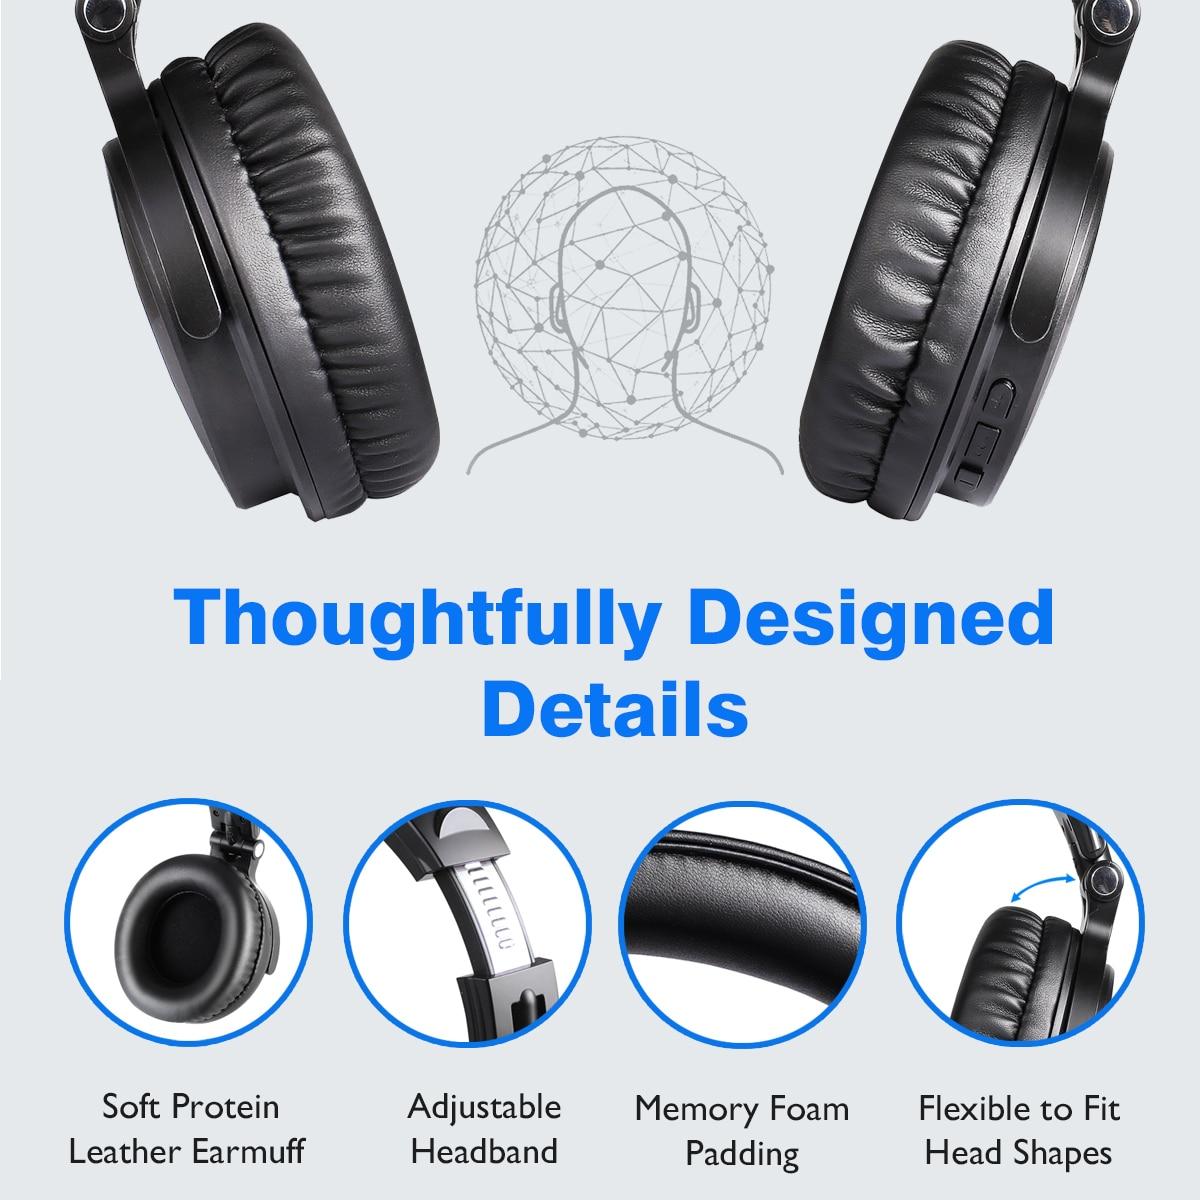 microfone embutido bluetooth 5.0 fone de ouvido